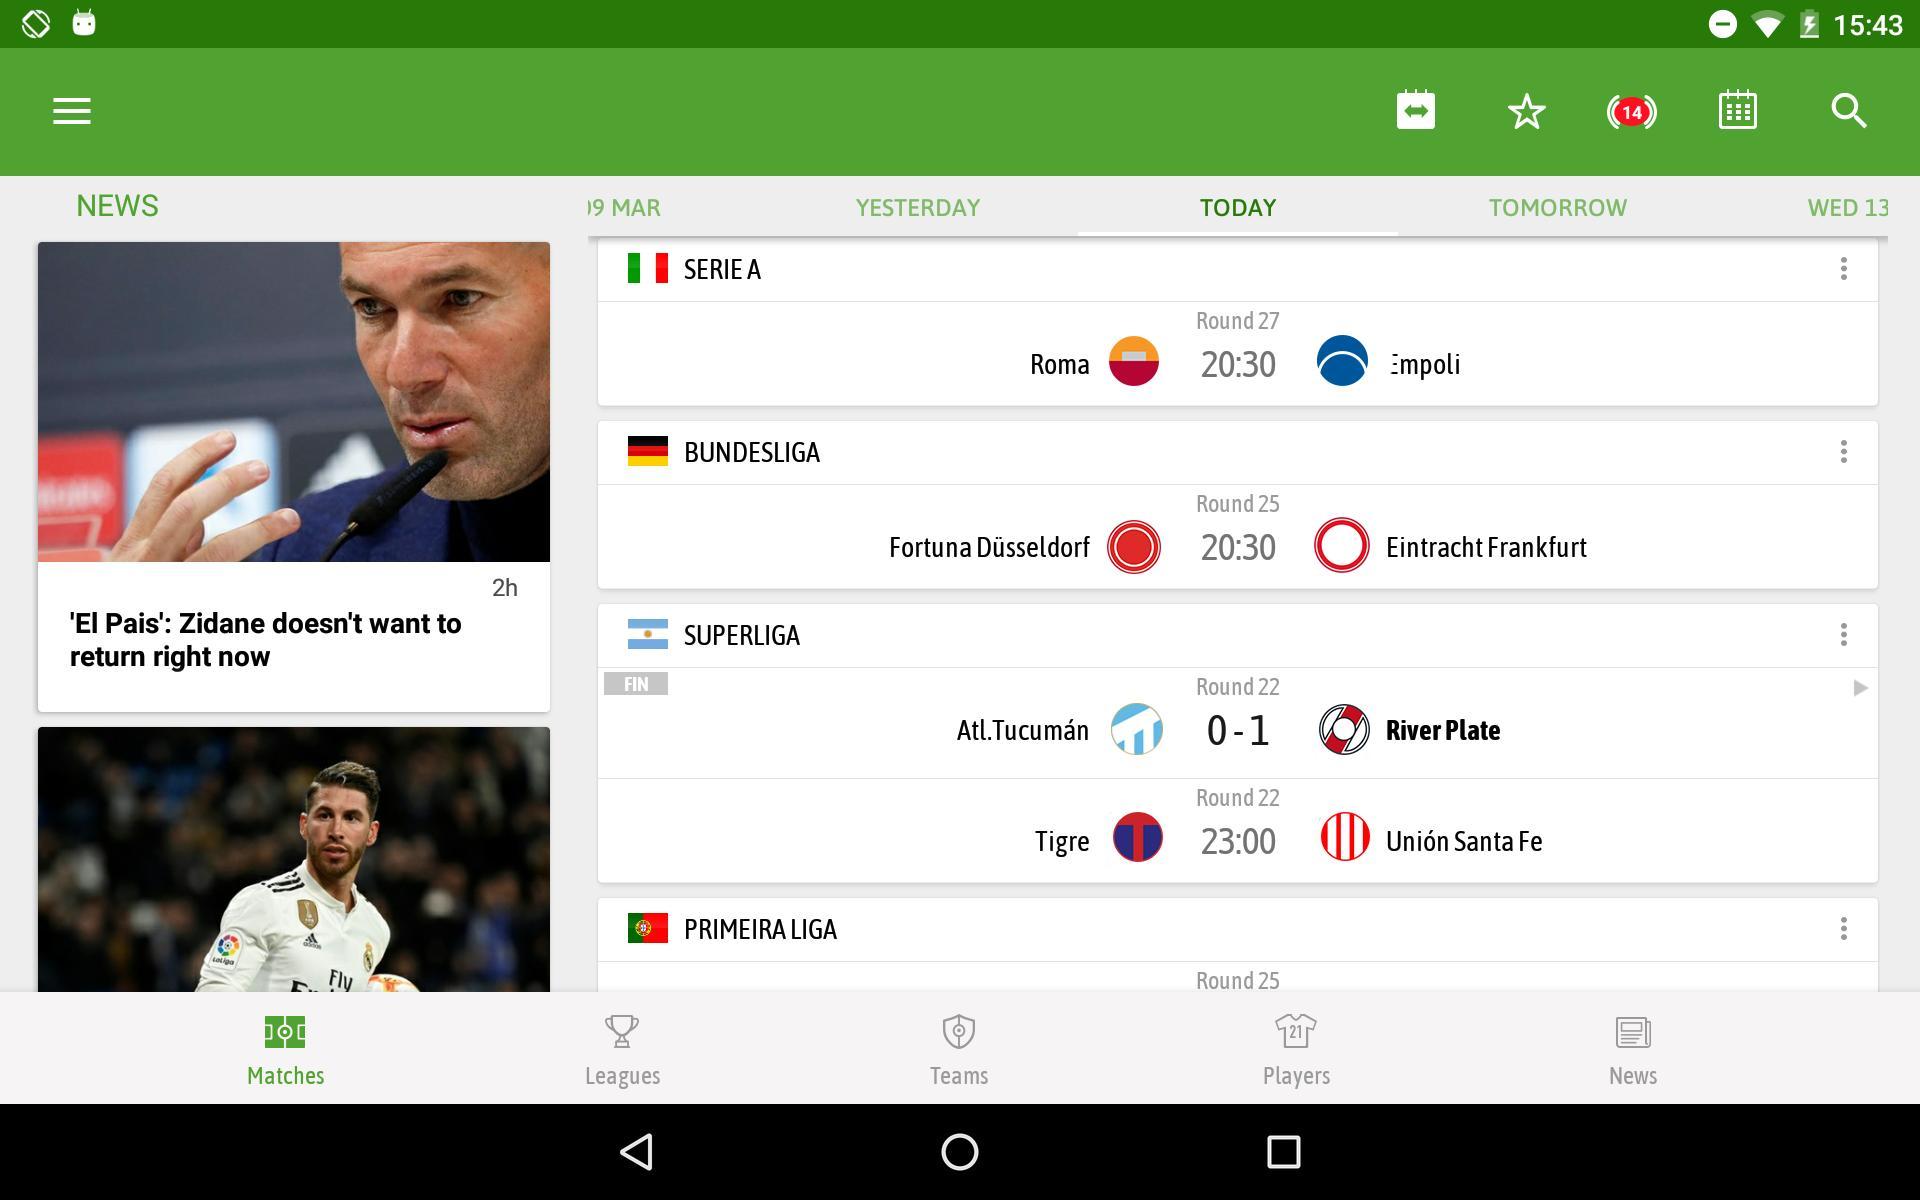 BeSoccer Soccer Live Score 5.1.1.4 Screenshot 12